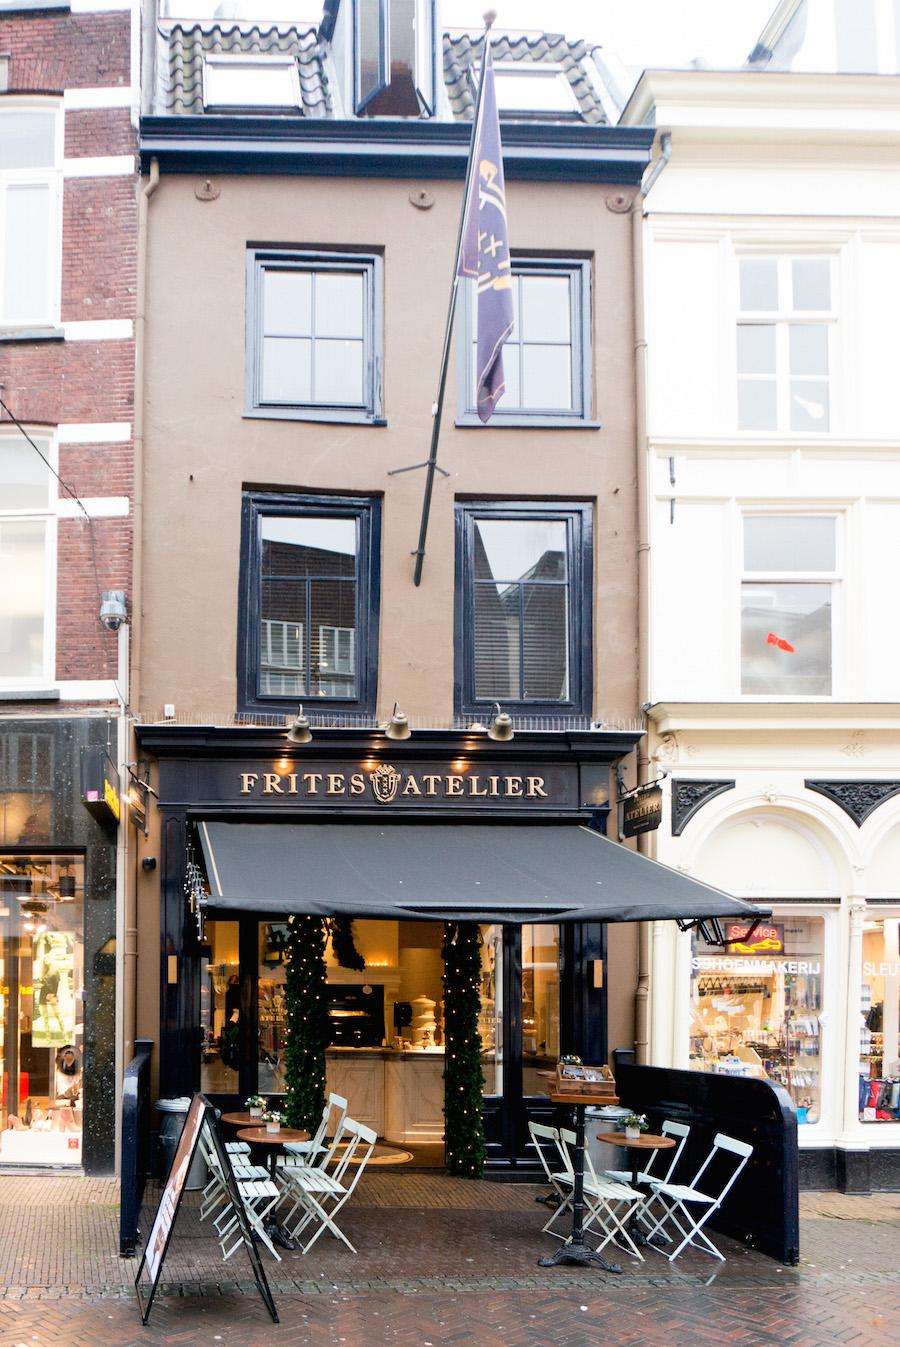 Frites Atelier Amsterdam in Utrecht